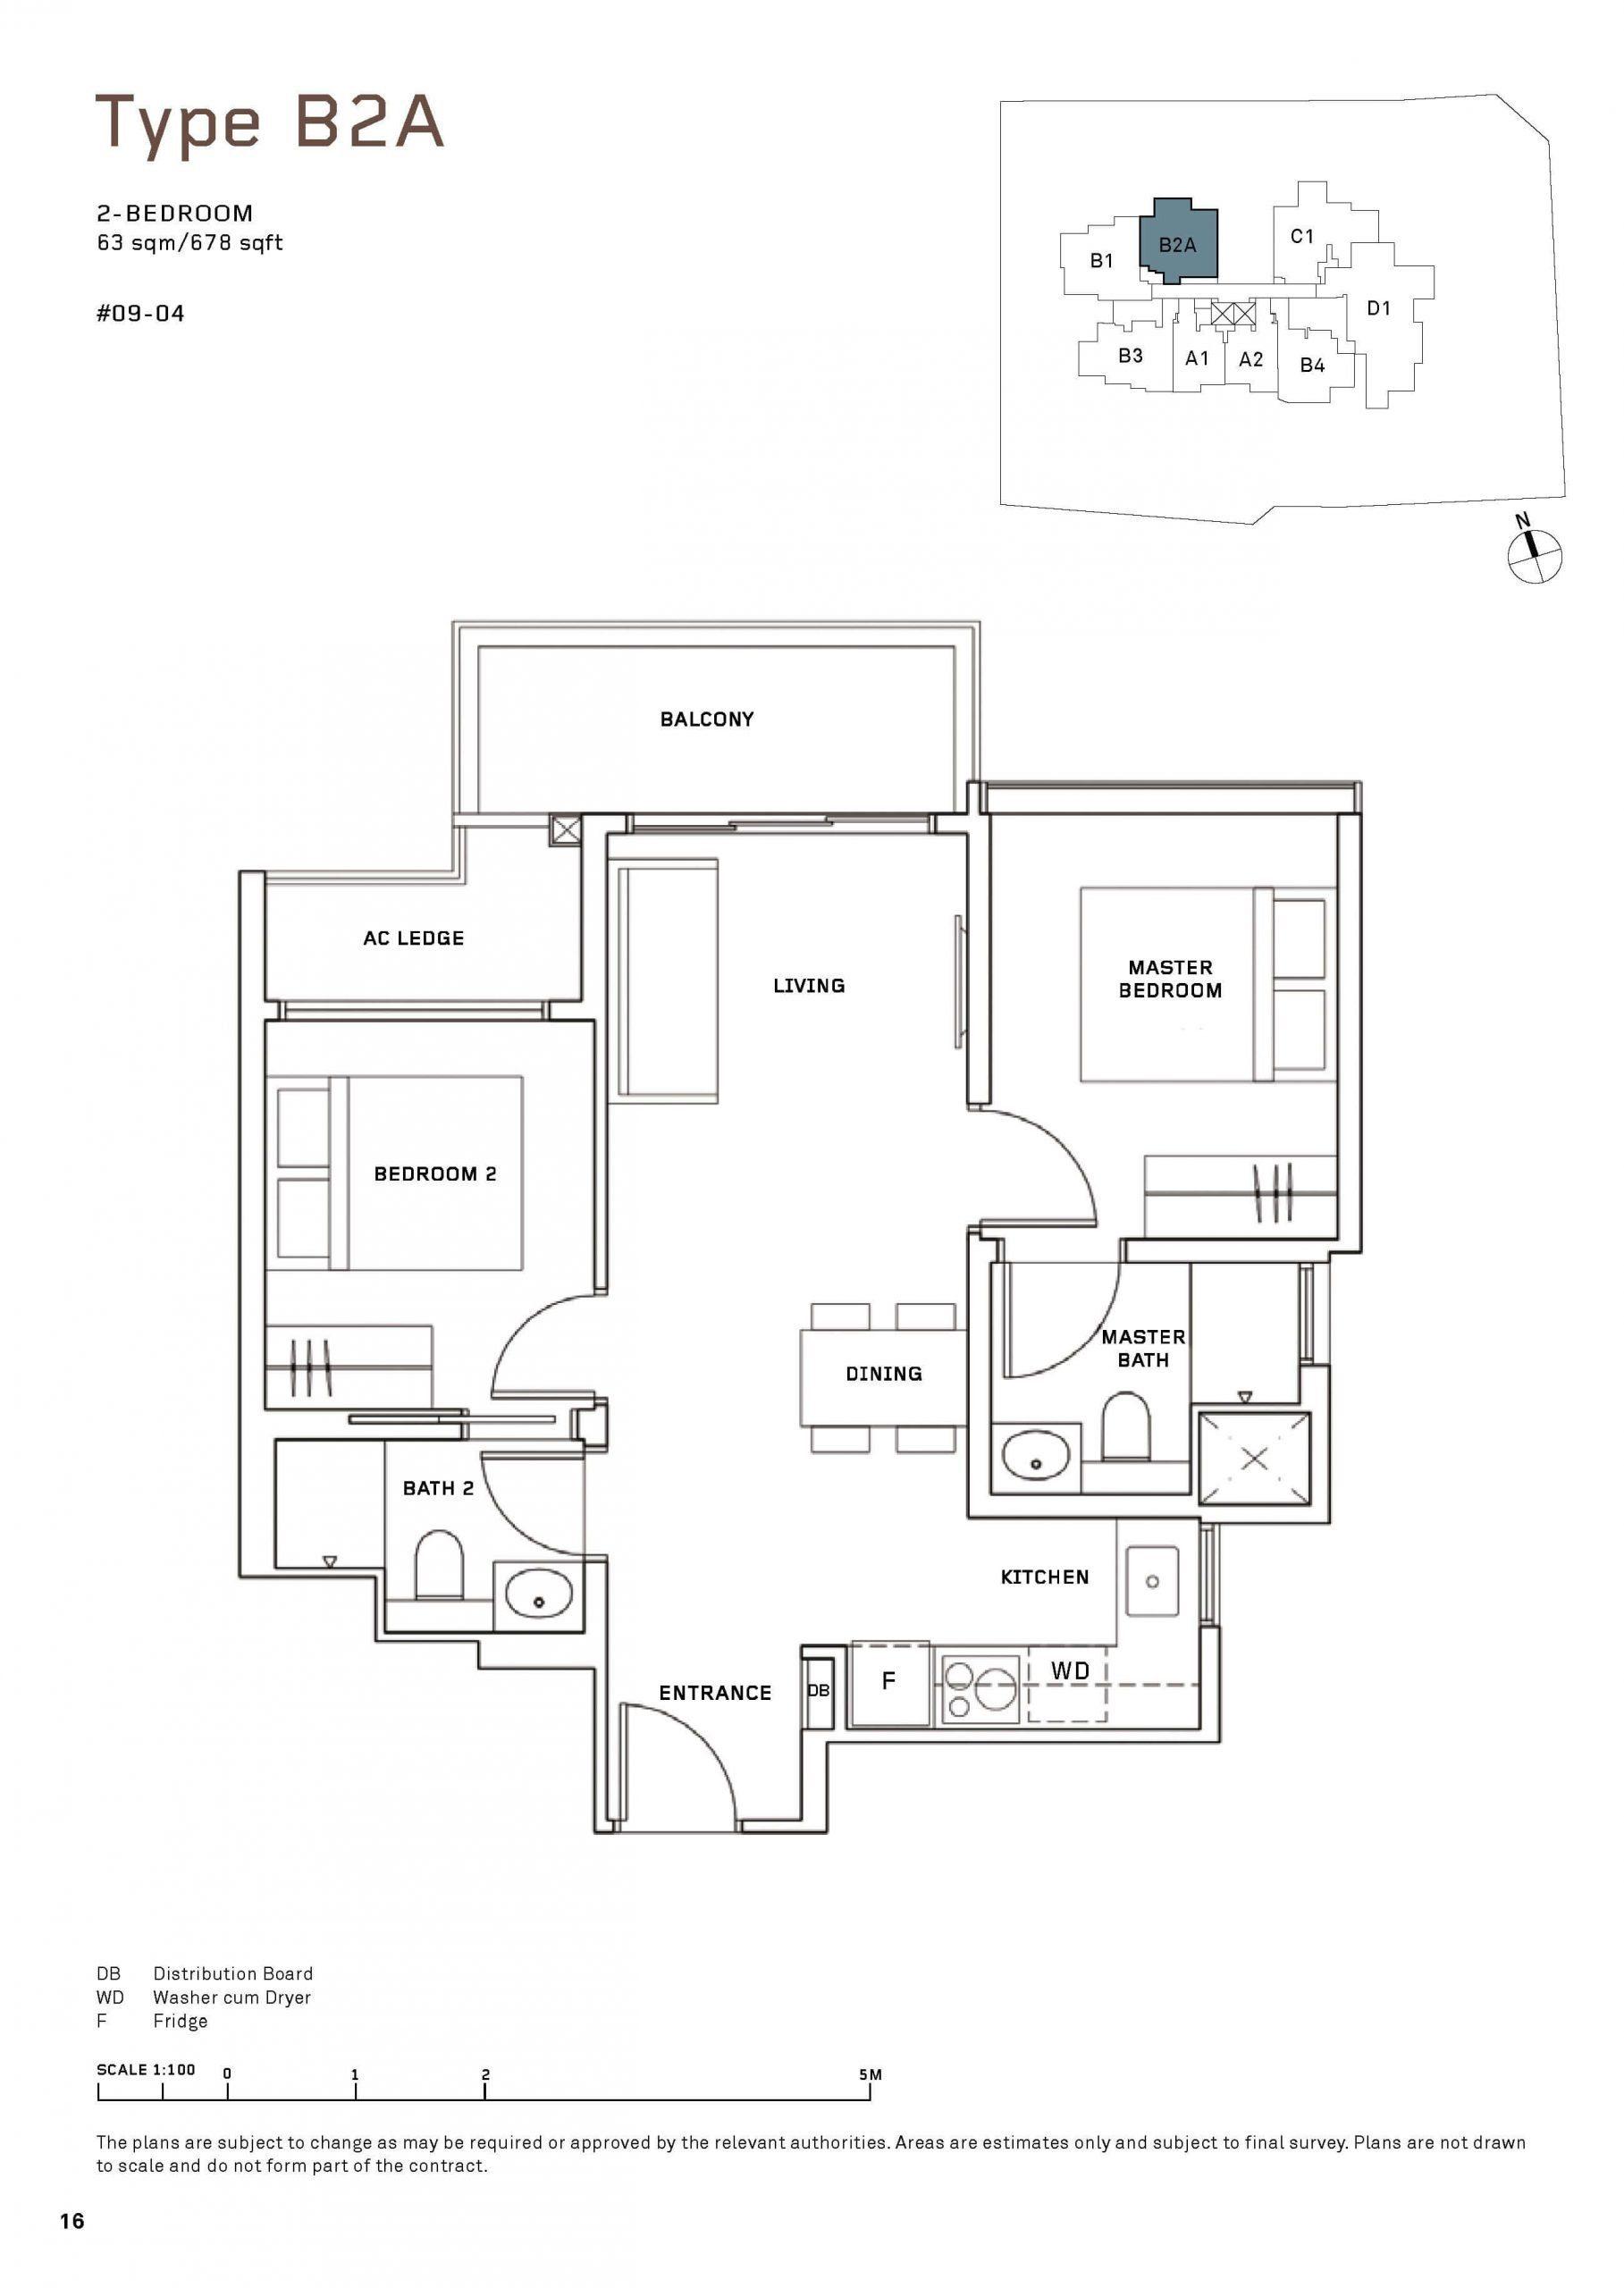 MYRA Condo Floor Plan 2 Bedroom 3 scaled